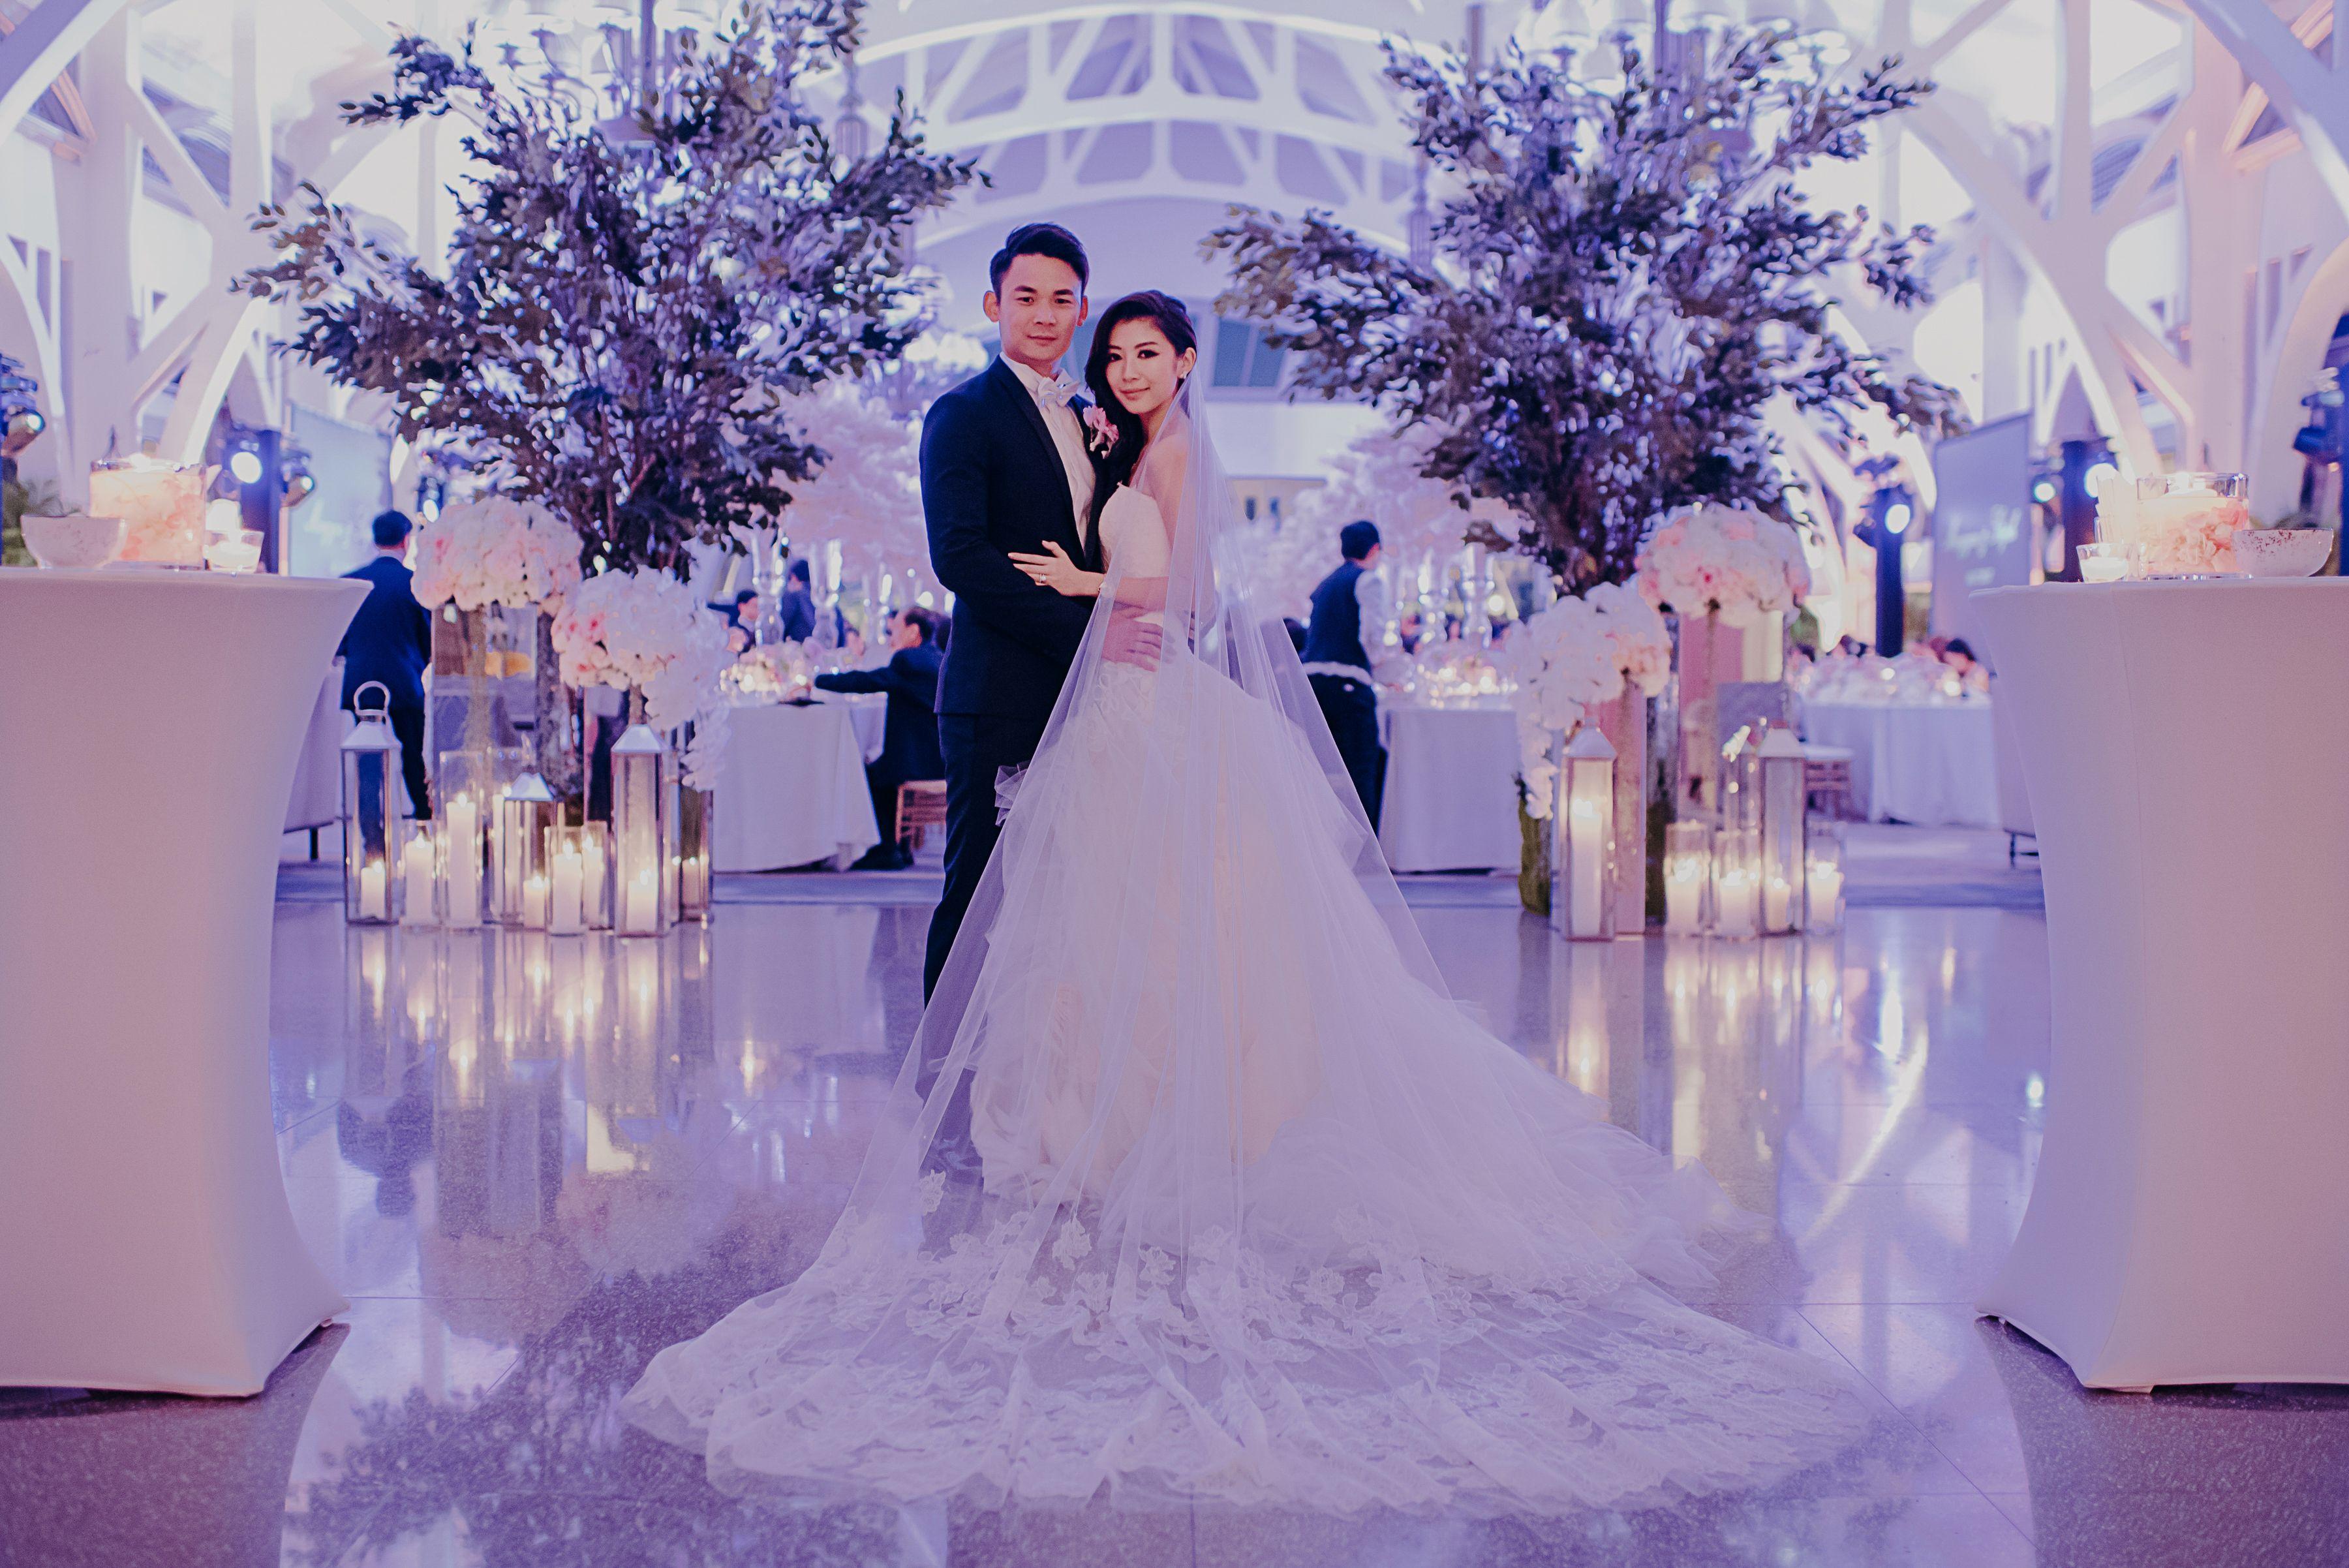 Photography Antelope Studios Florist Fiore Dorato Gown Vera Wang Wedding Planner Chere W Crazy Rich Asians Wedding Asian Wedding Themes Movie Theme Wedding